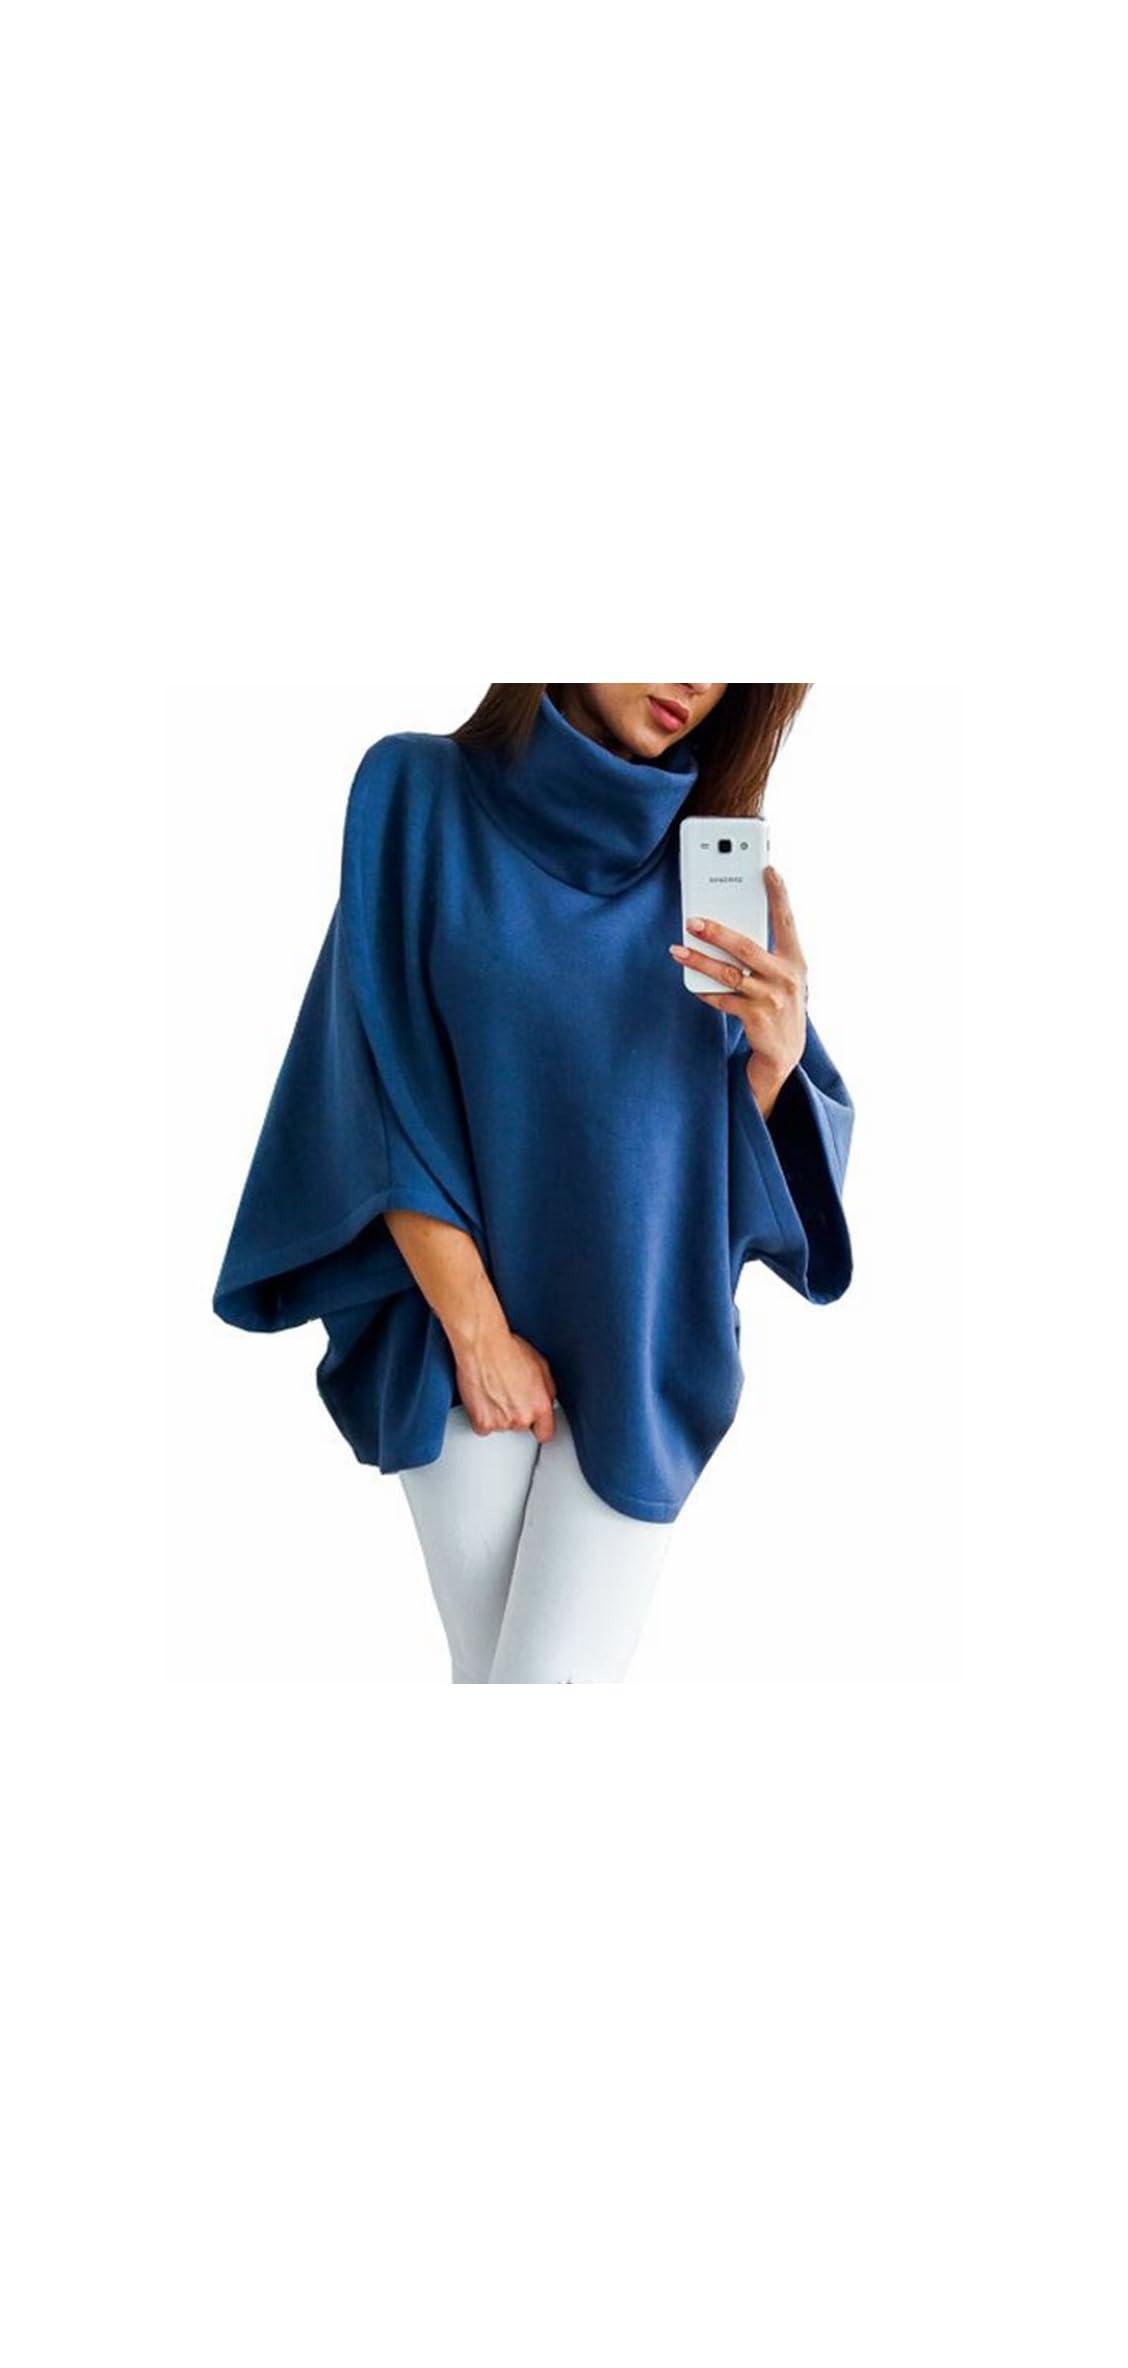 Women's Turtleneck / Batwing Sleeve Irregular Hem Tunic